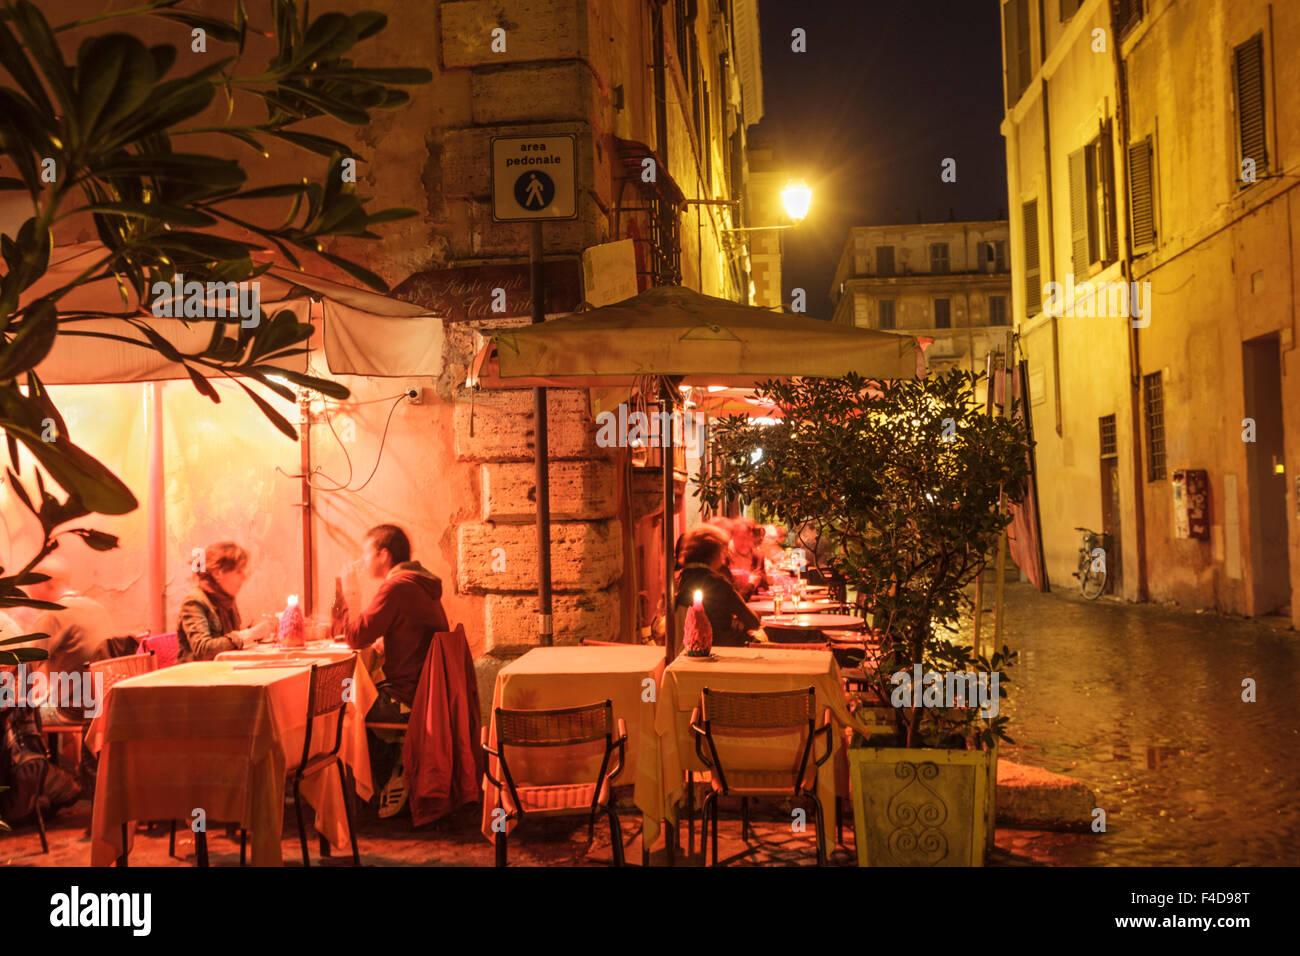 Alfresco dining at night inTrastevere, Rome, Italy - Stock Image